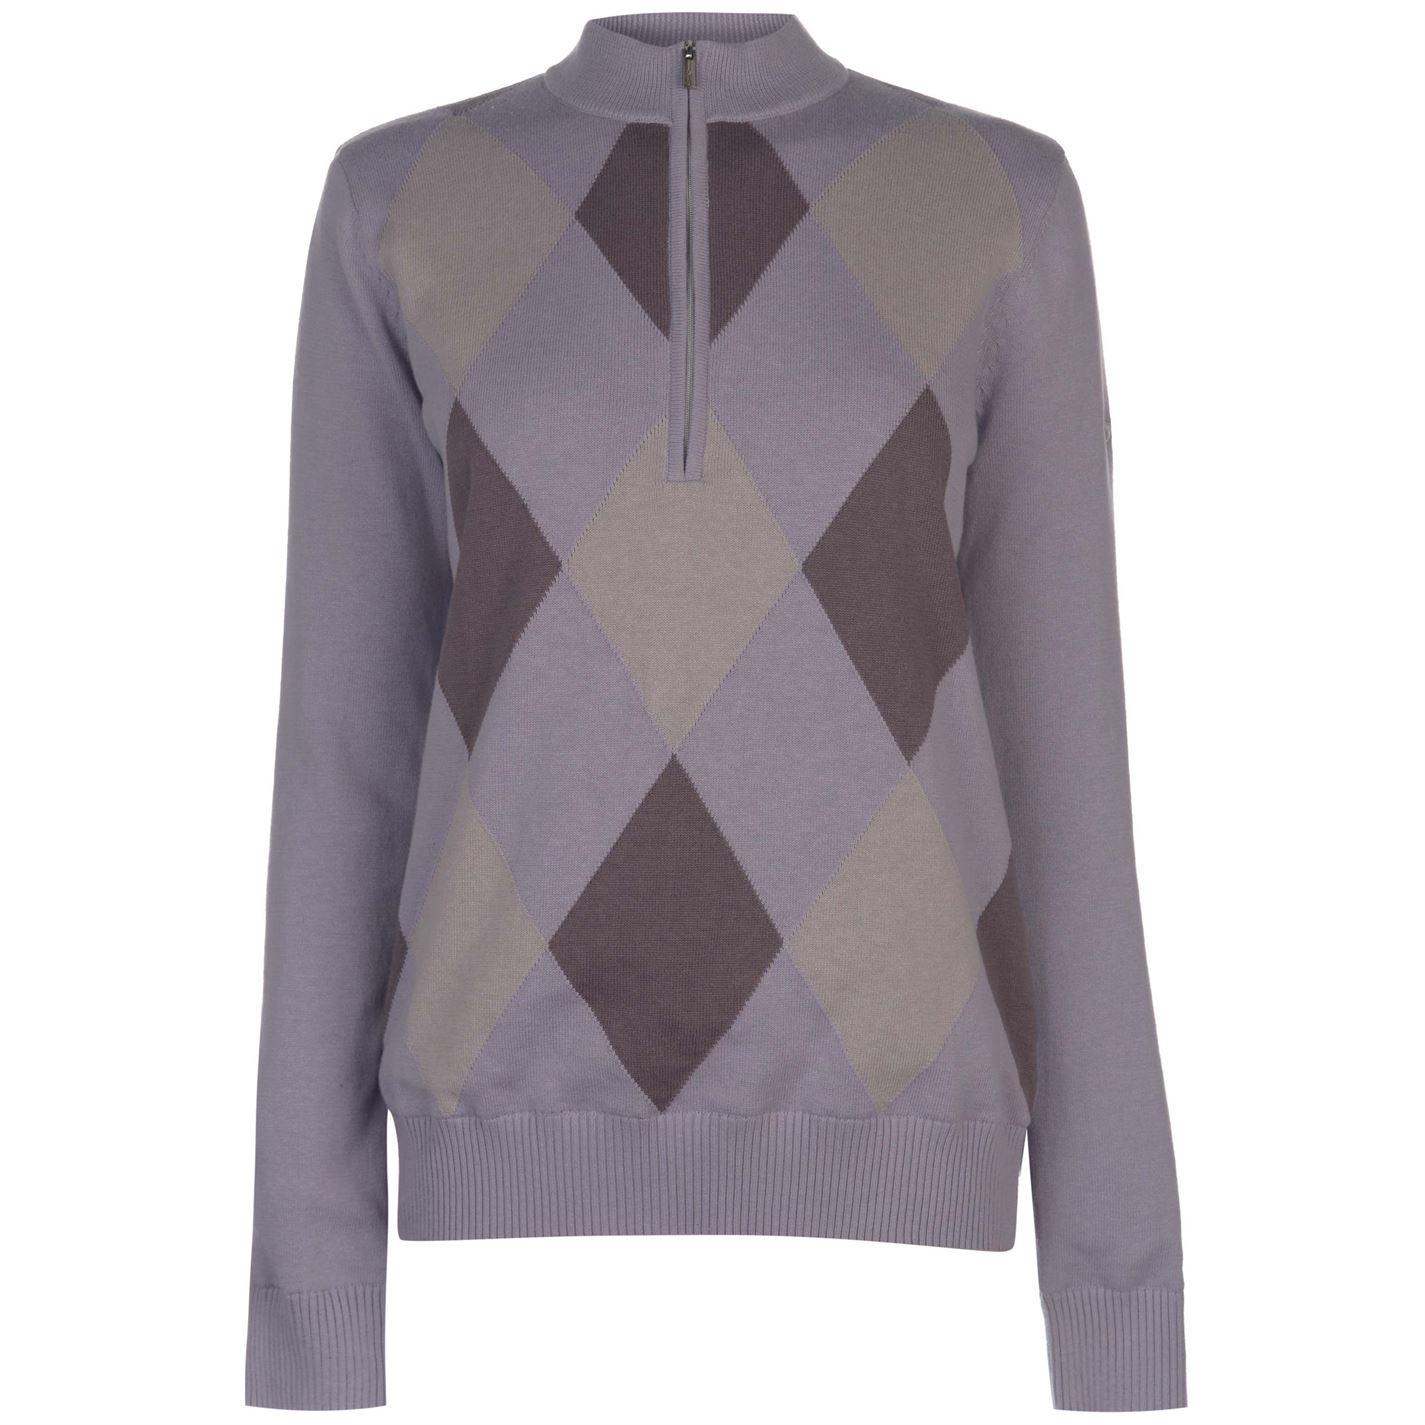 Slazenger half  Zip Argyle Lined Pullover Ladies